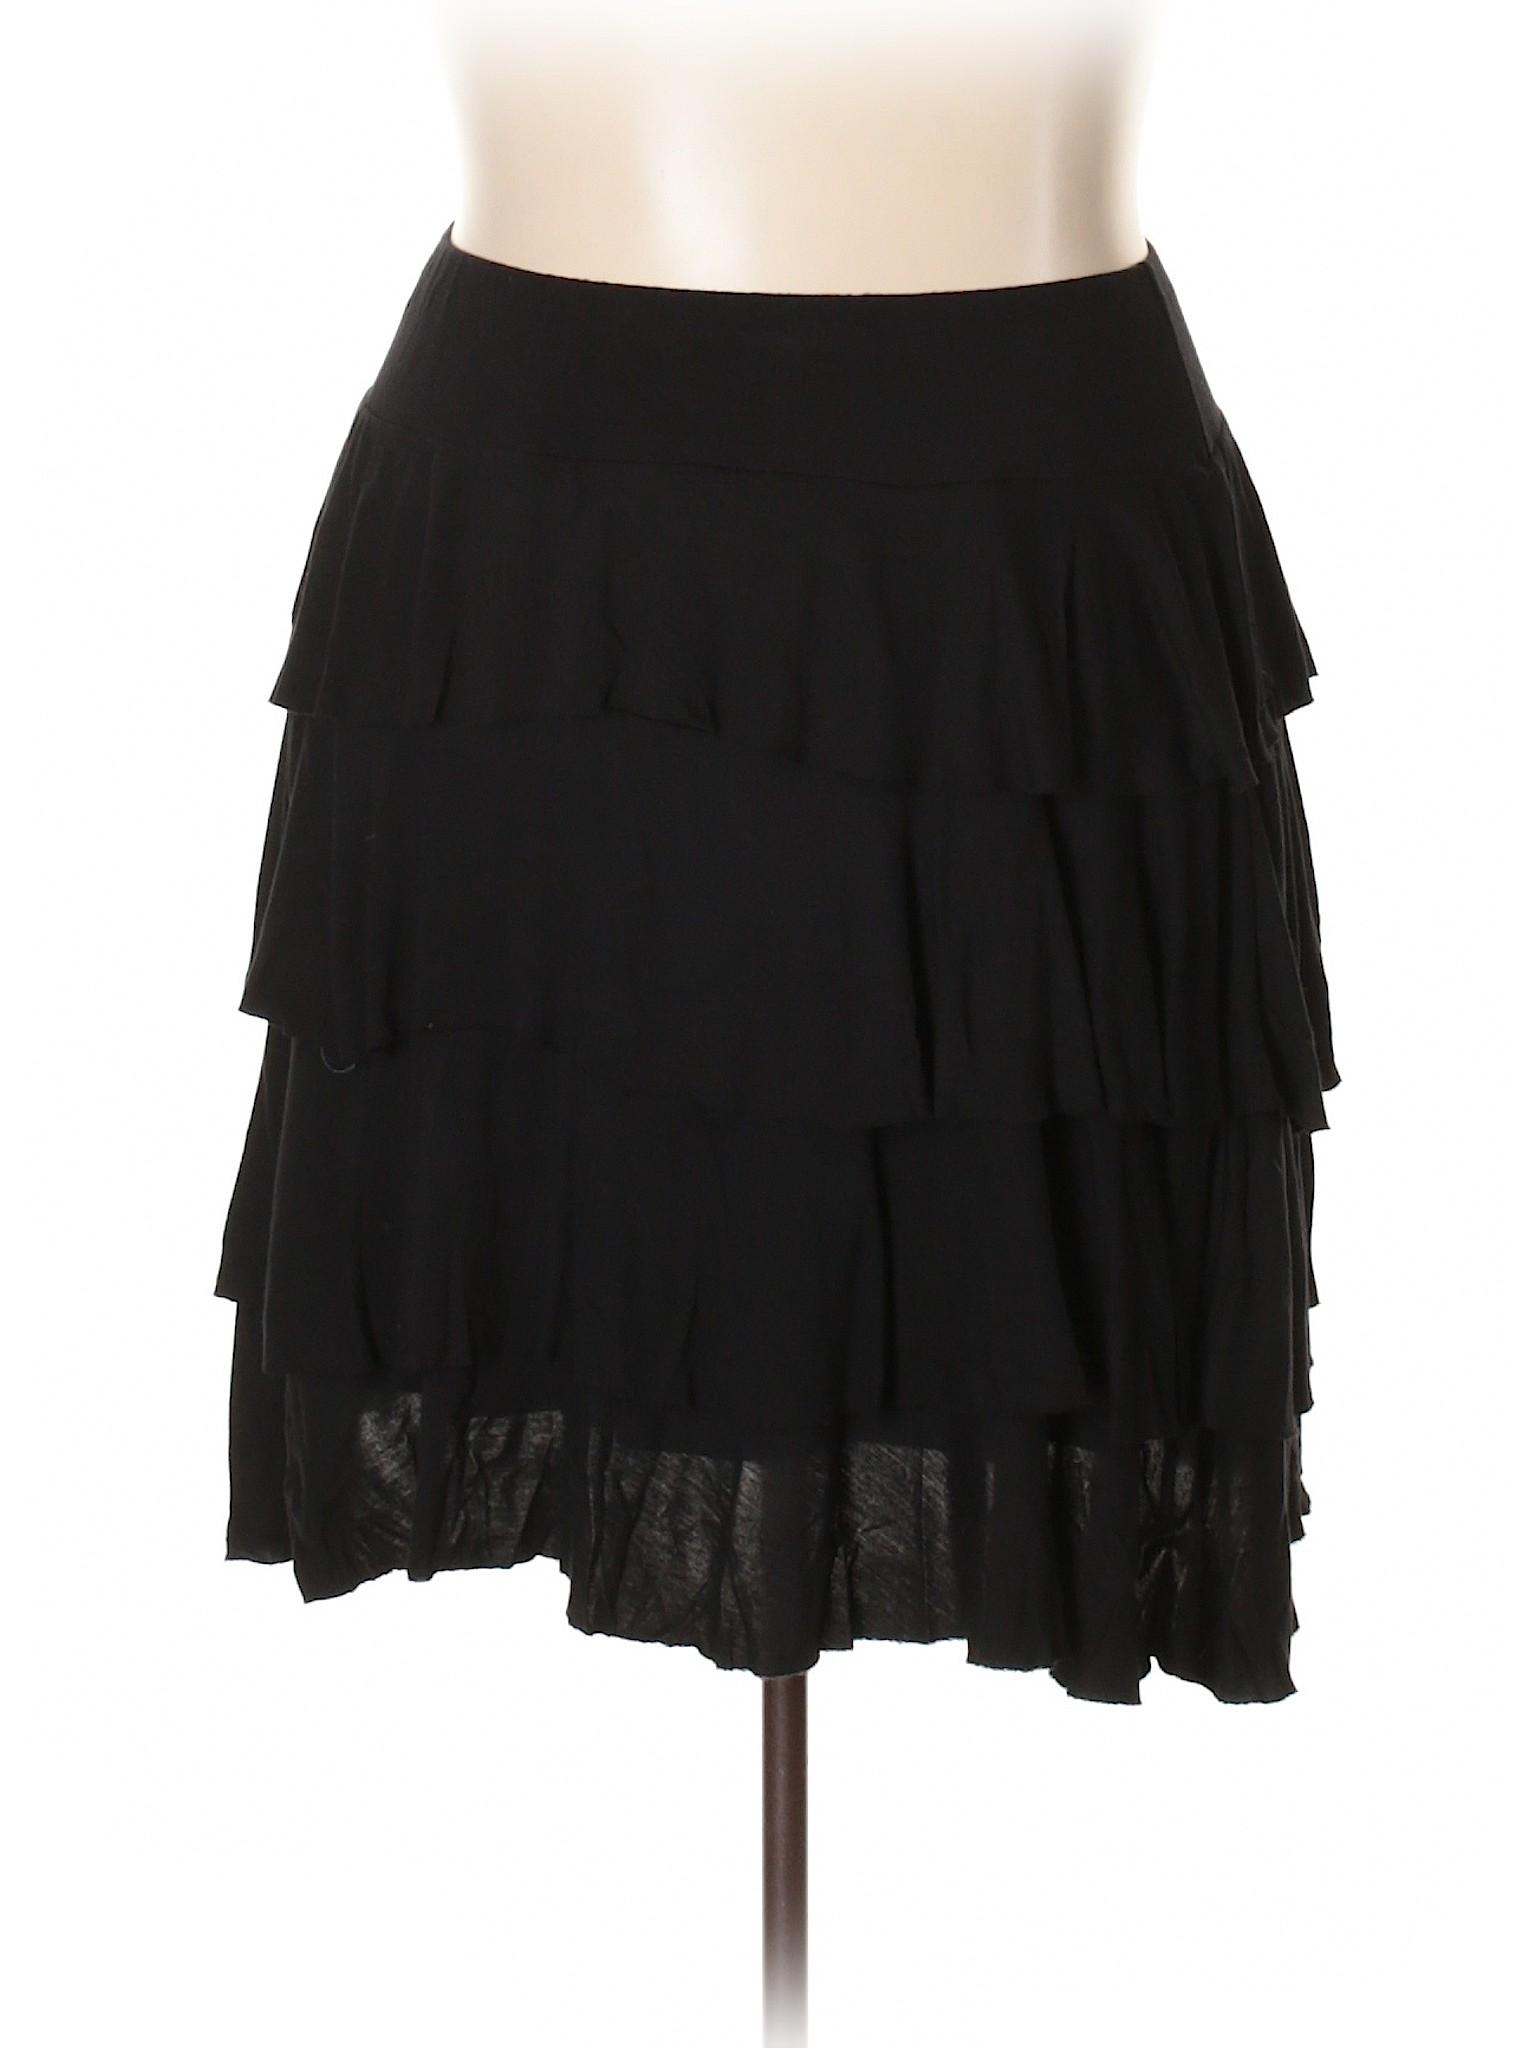 Skirt leisure Boutique Concepts INC Casual International xXqdFvq